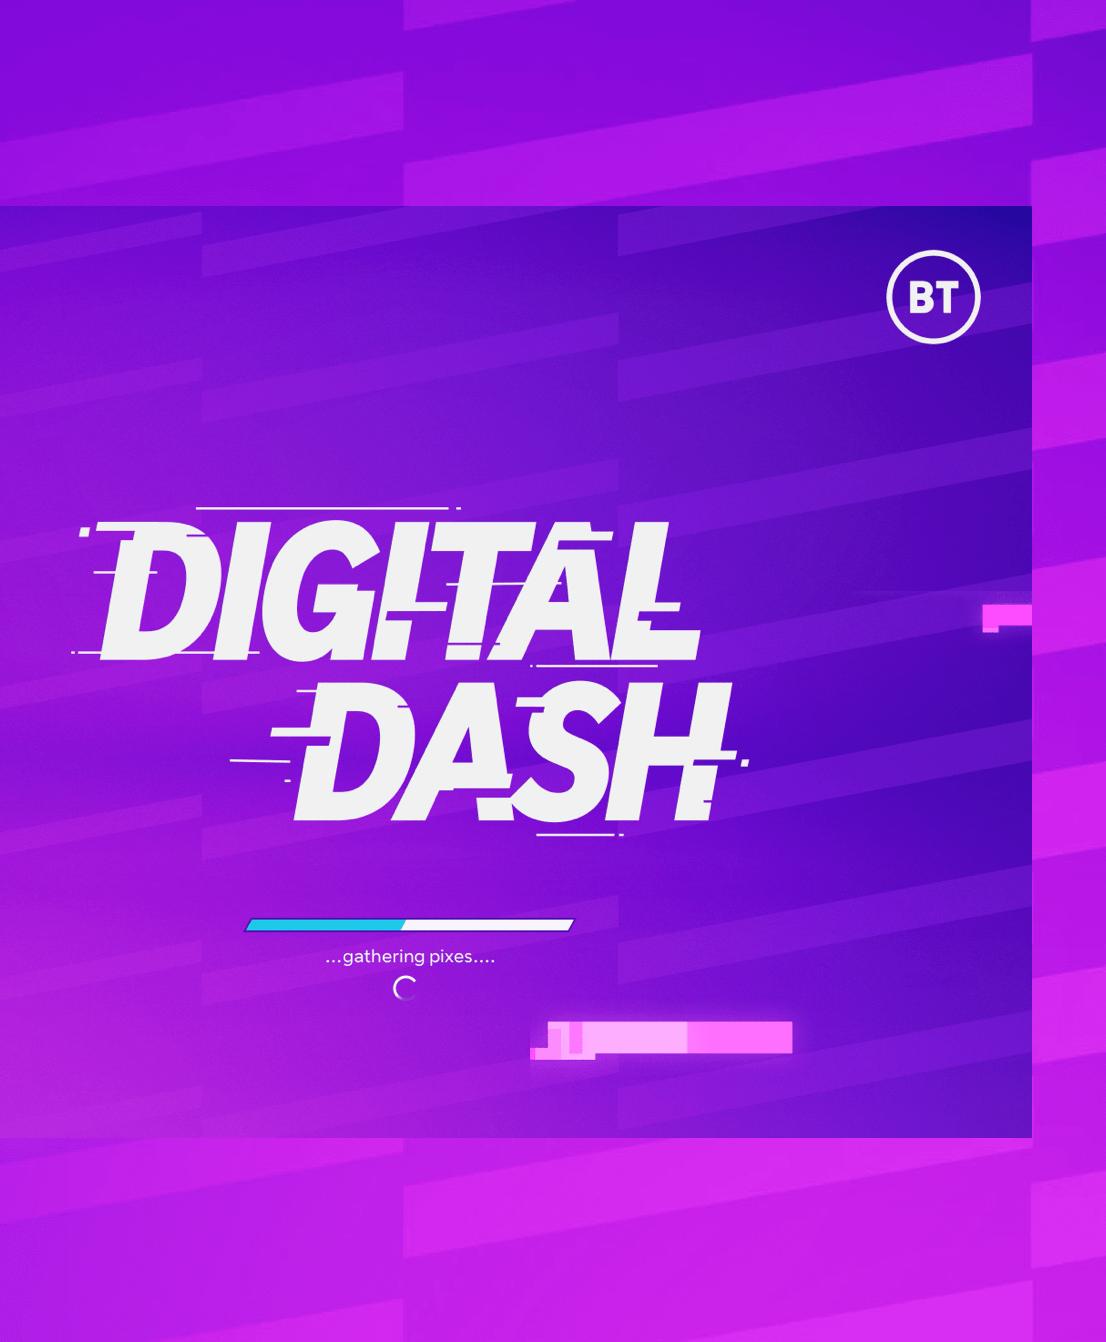 The Digital Dash branding logo